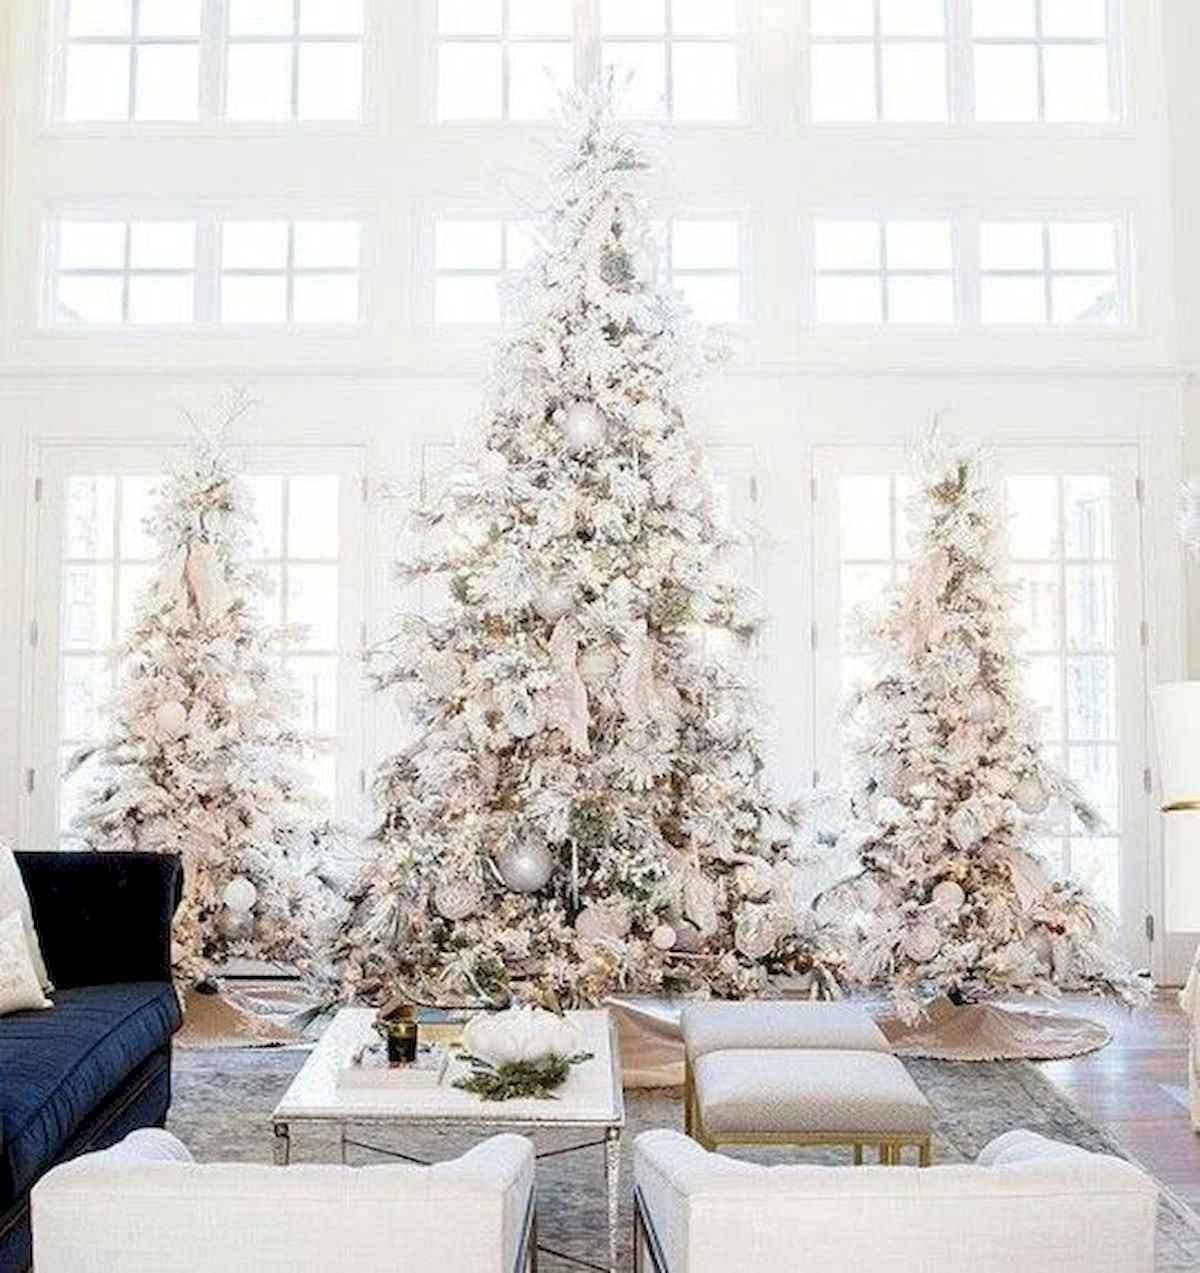 40 elegant christmas tree decorations ideas (2)